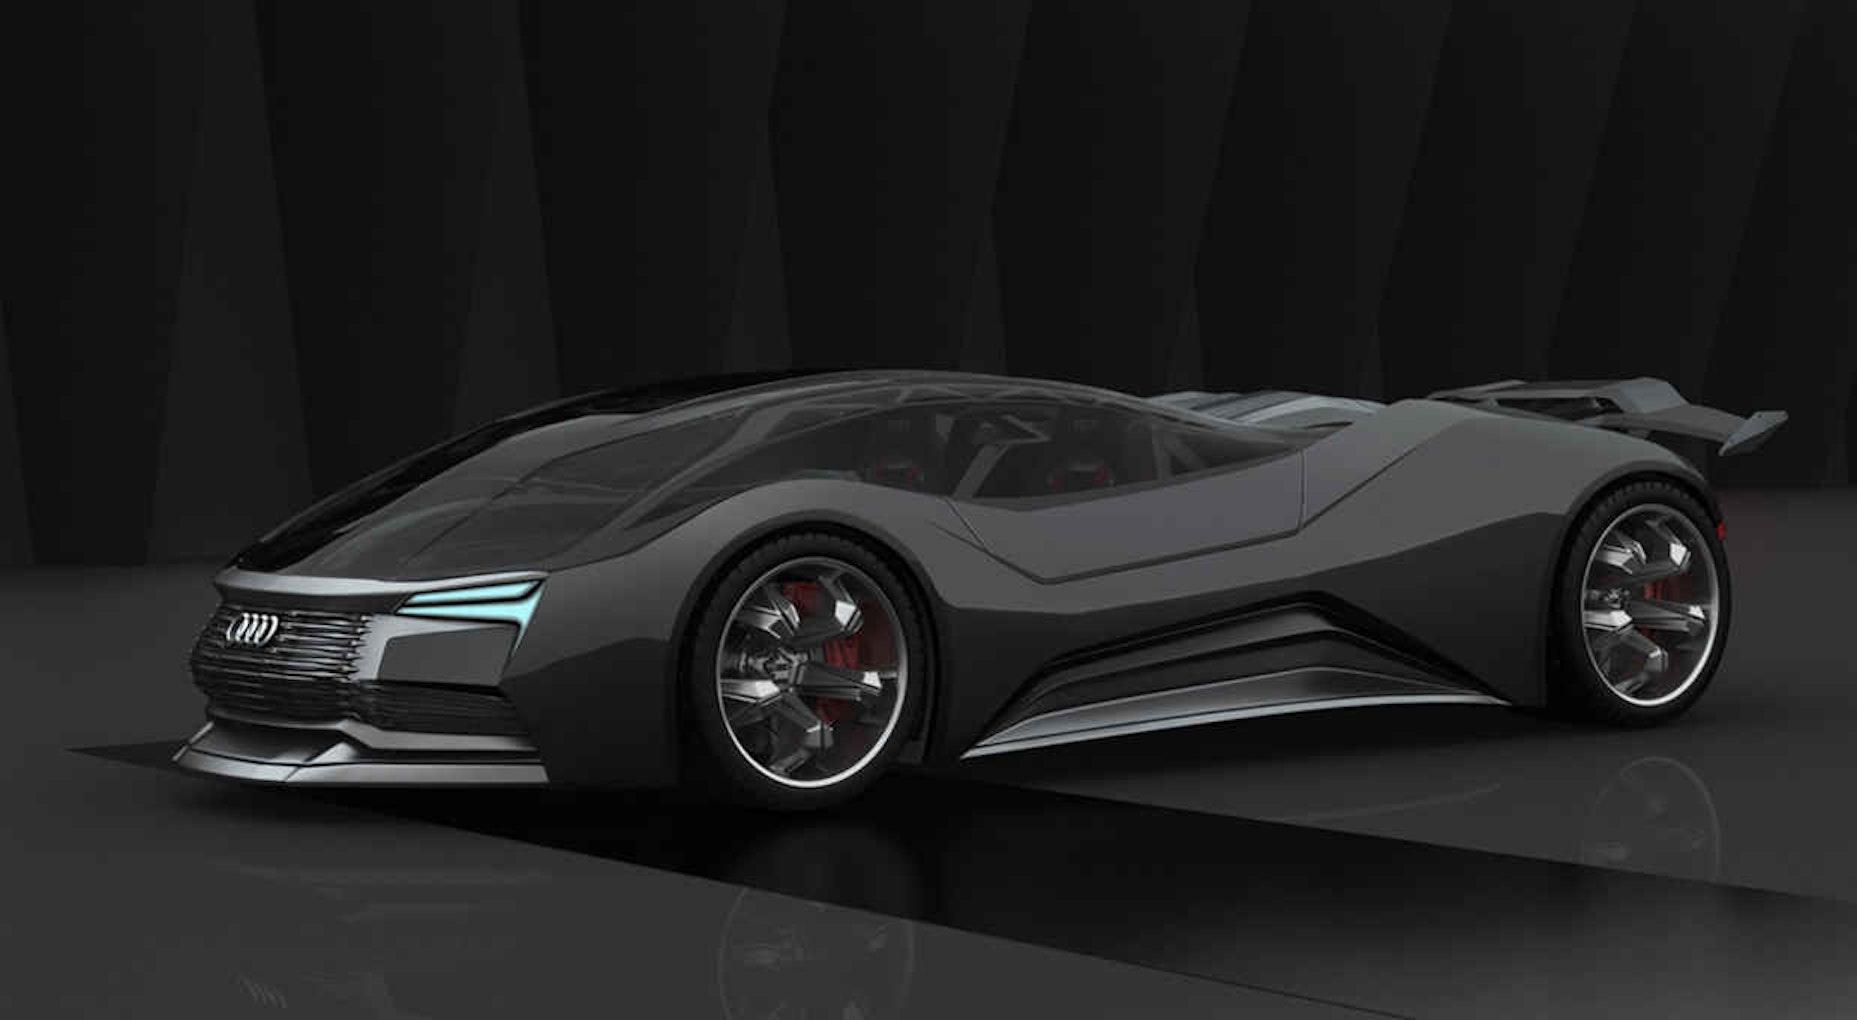 How Russia's Newest Vaporware Vehicle Mimics Energy